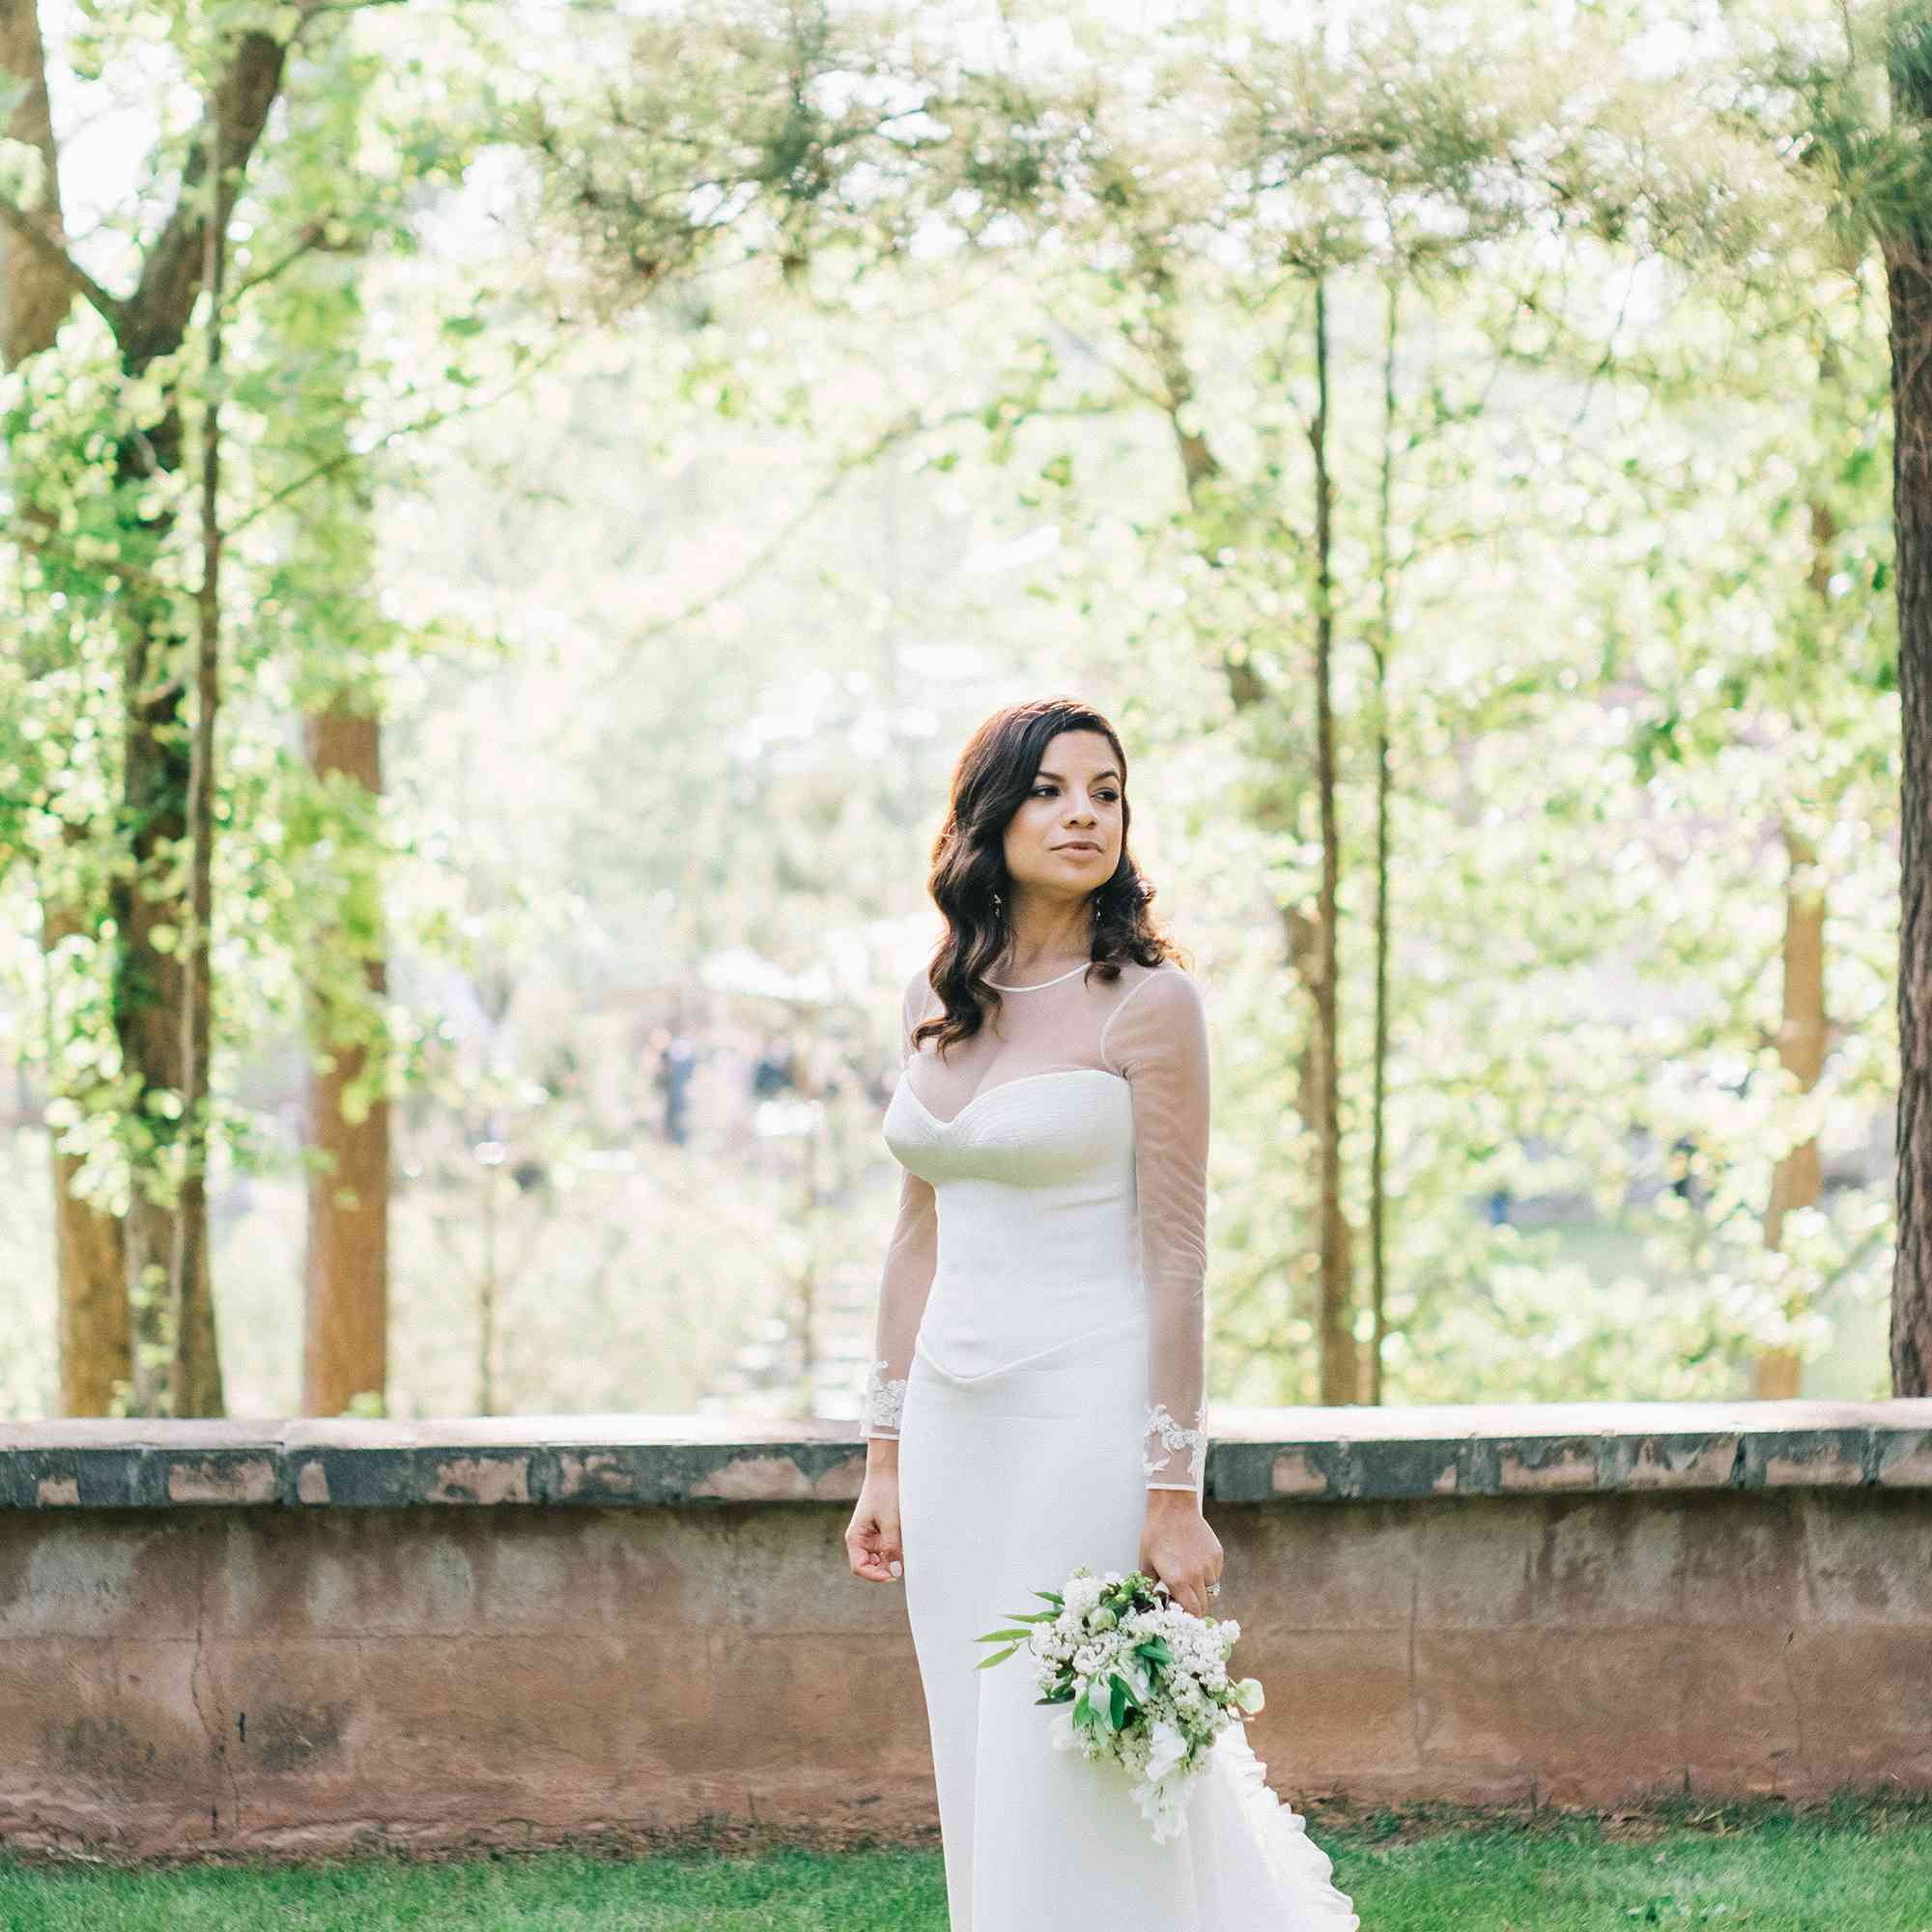 Bride solo with bouquet